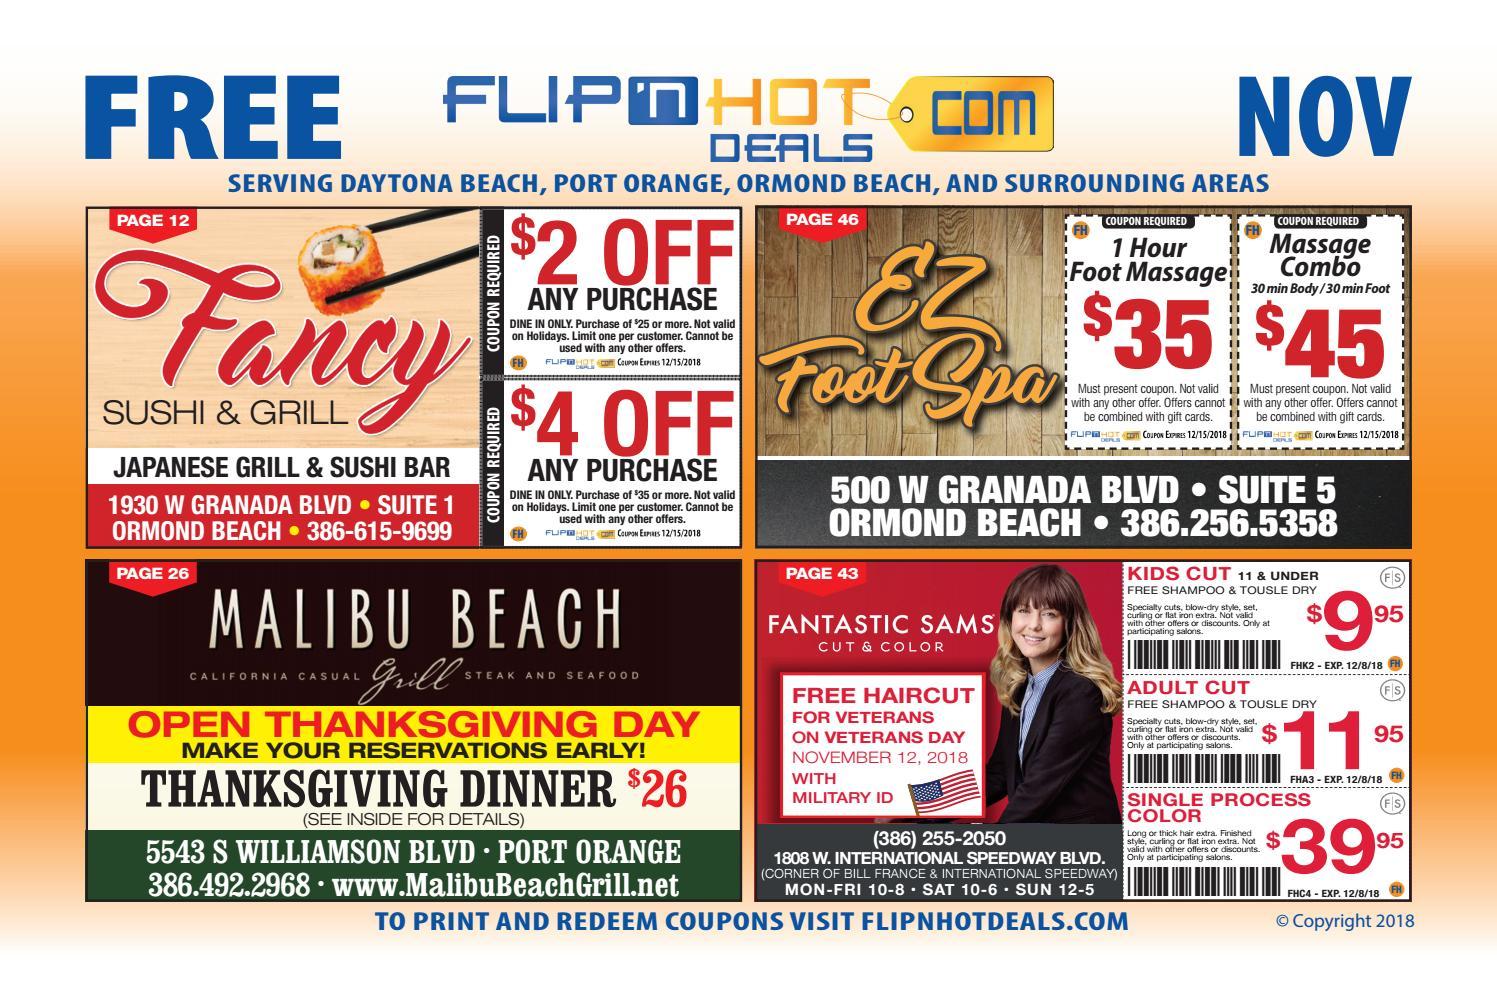 Flip Nhot Deals Coupon Book November